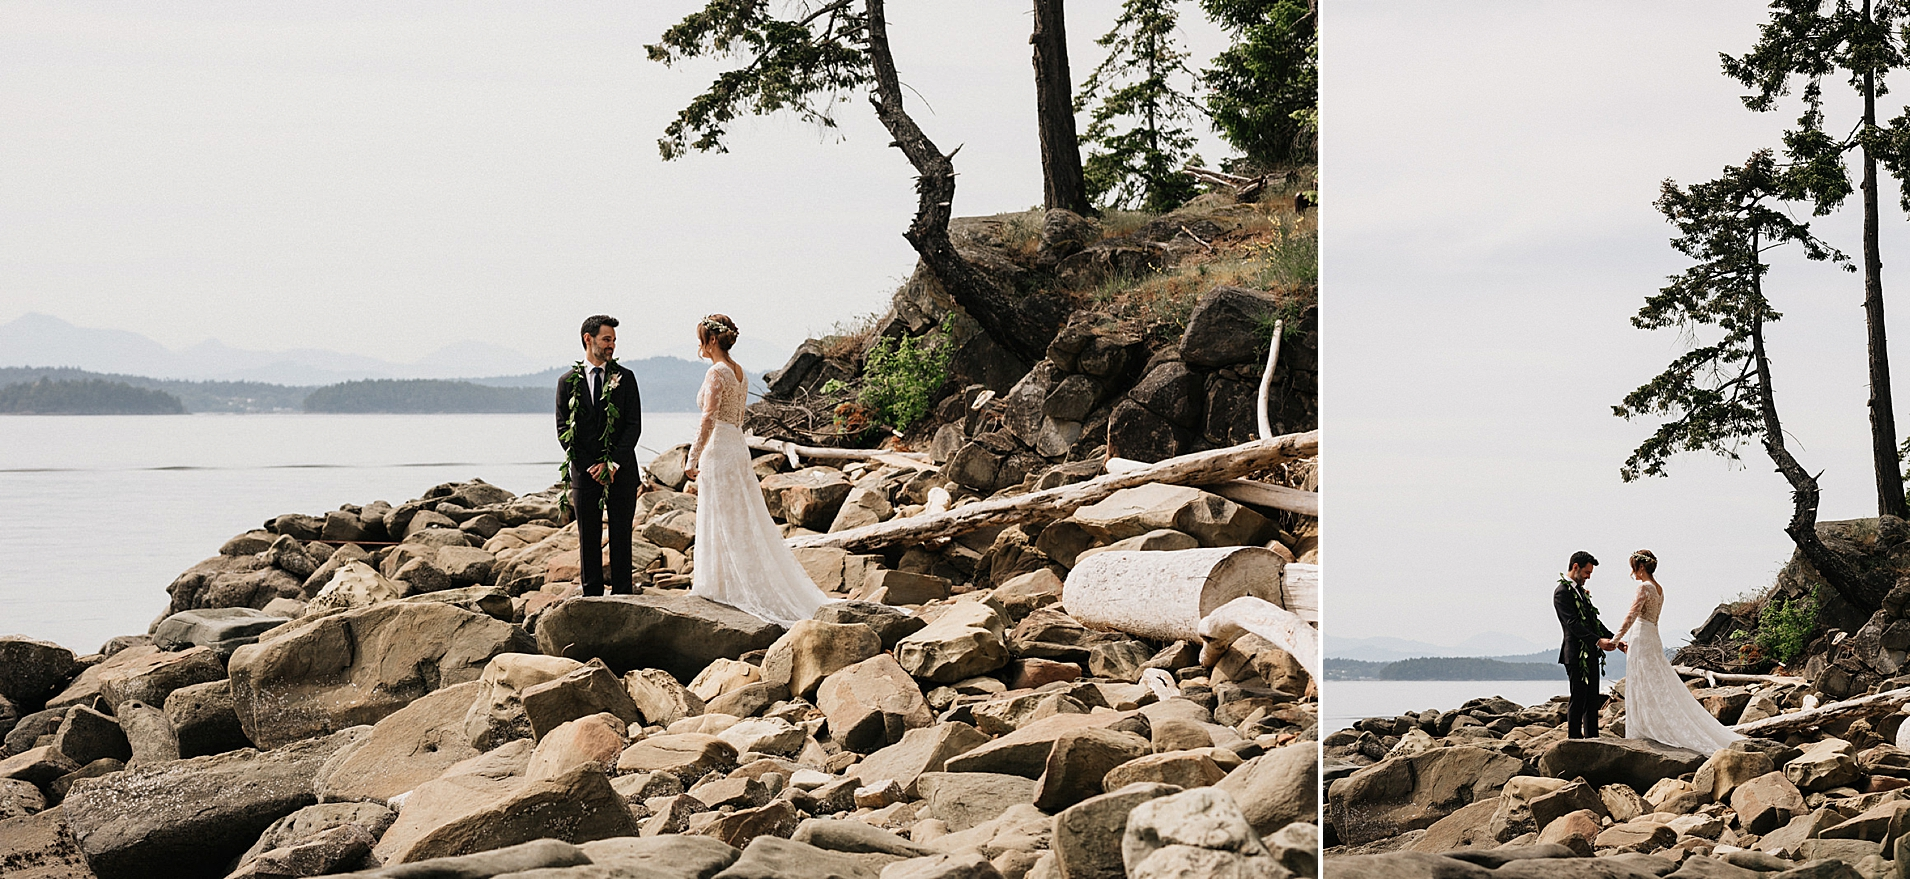 first look on beach bodega ridge.jpg